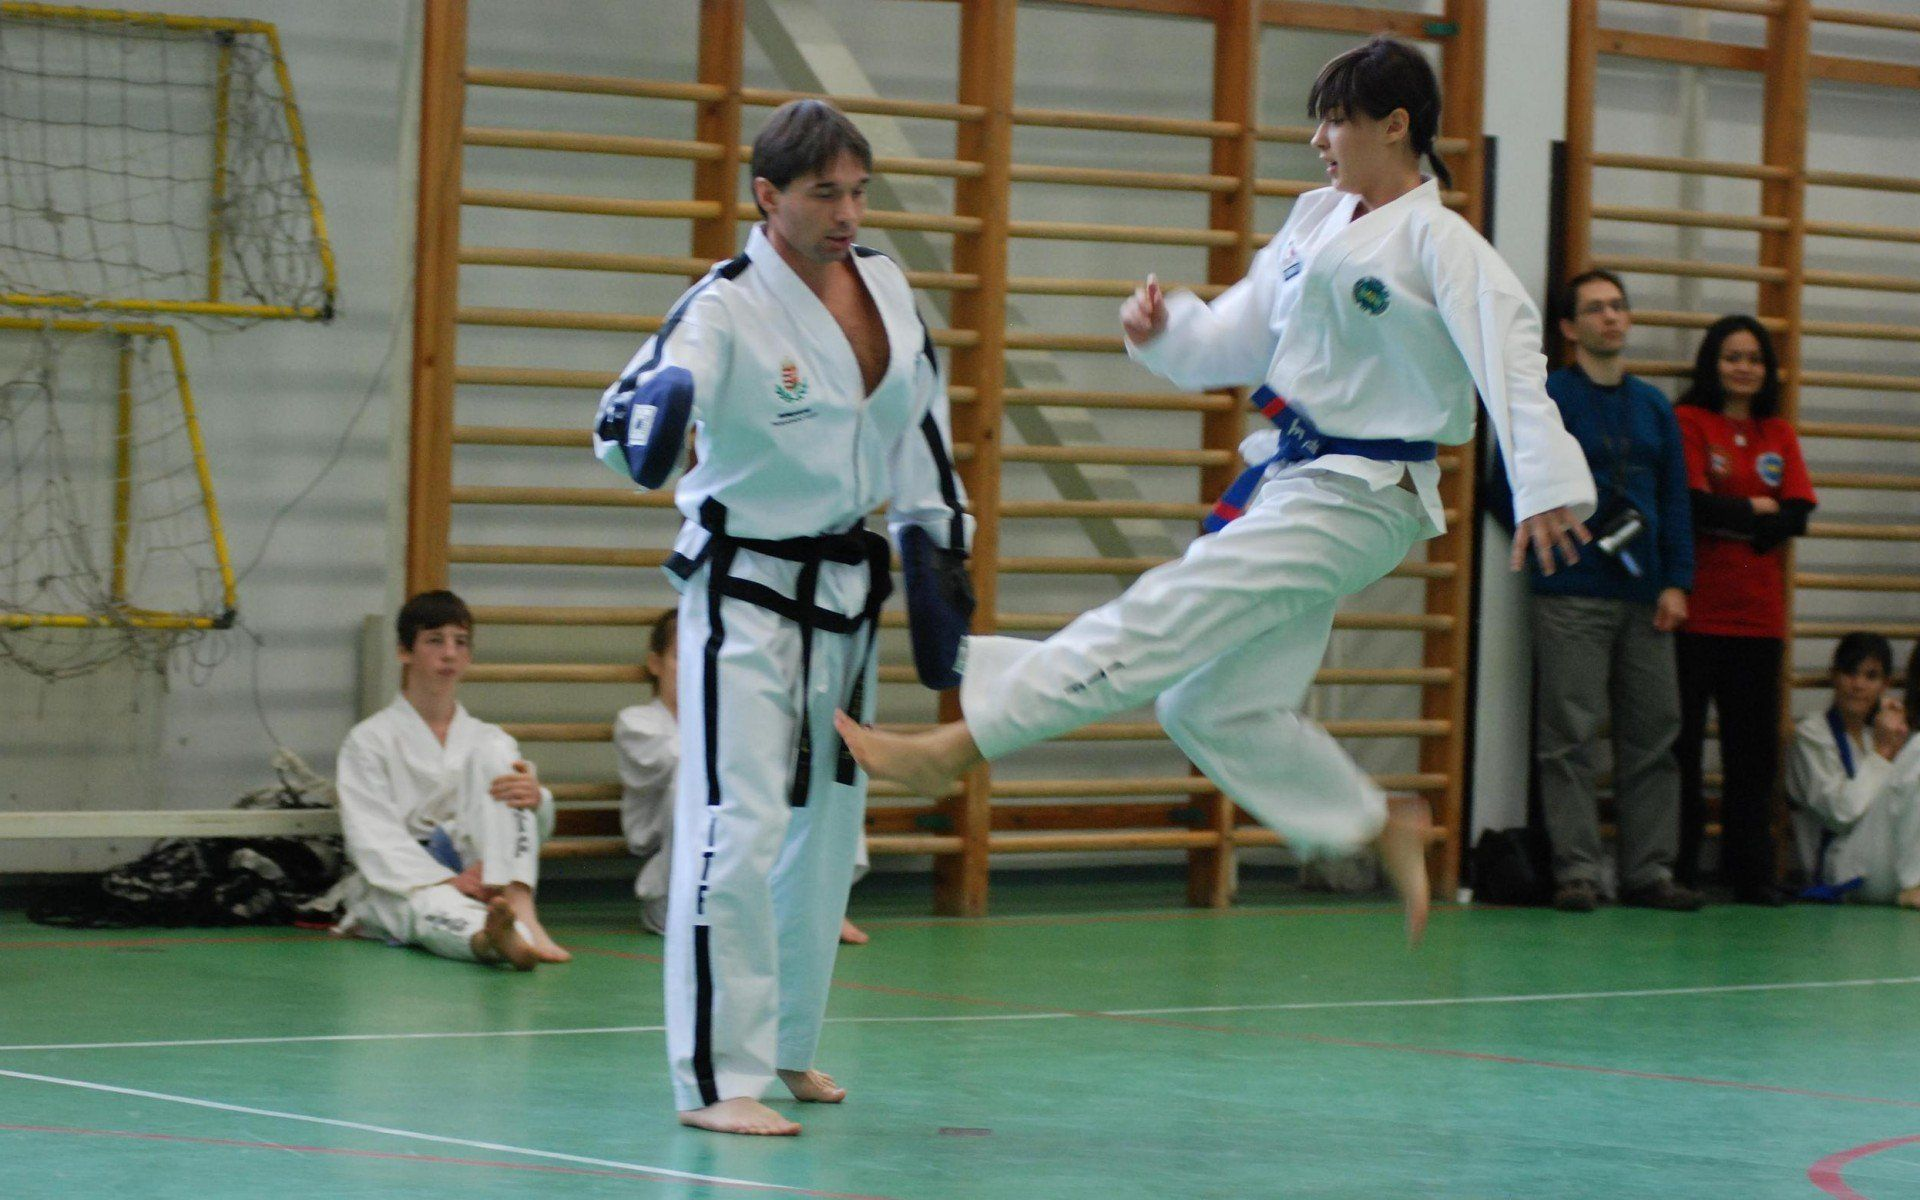 Teakwondo 4K Wallpapers - Top Free Teakwondo 4K Backgrounds